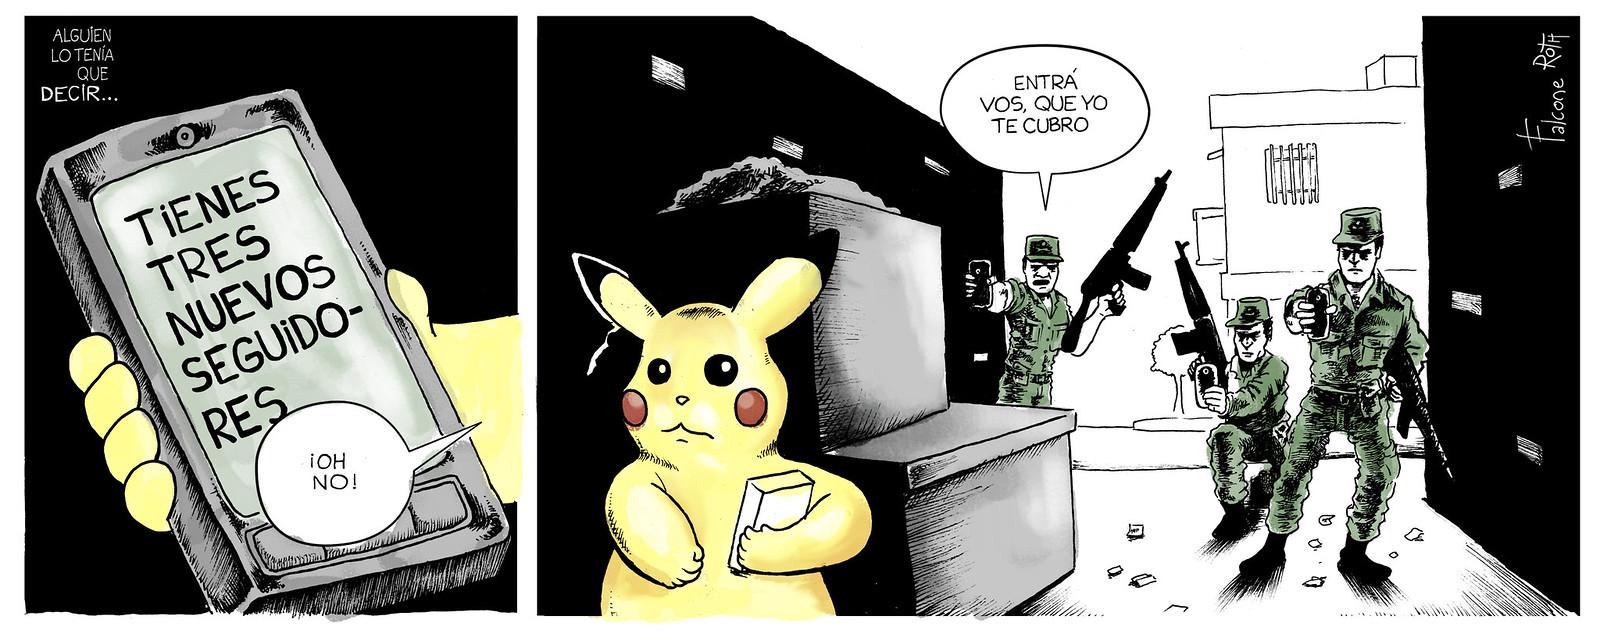 gendarmes siguiendo a Pokemon